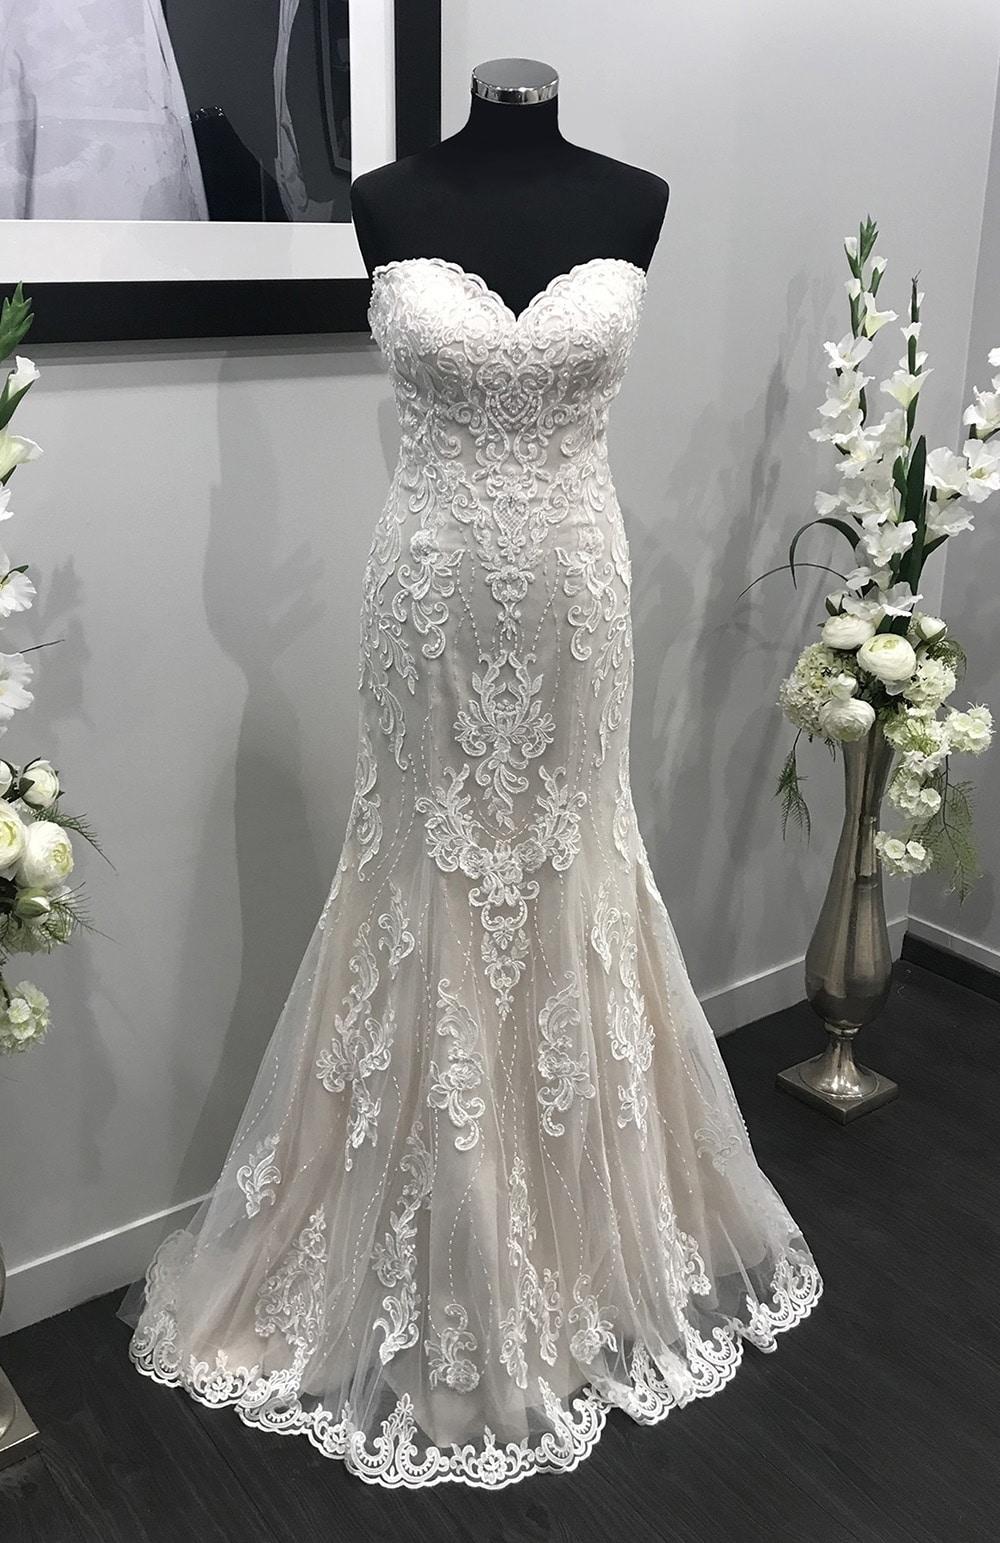 Robe de mariée Modèle Marylin – 799 €